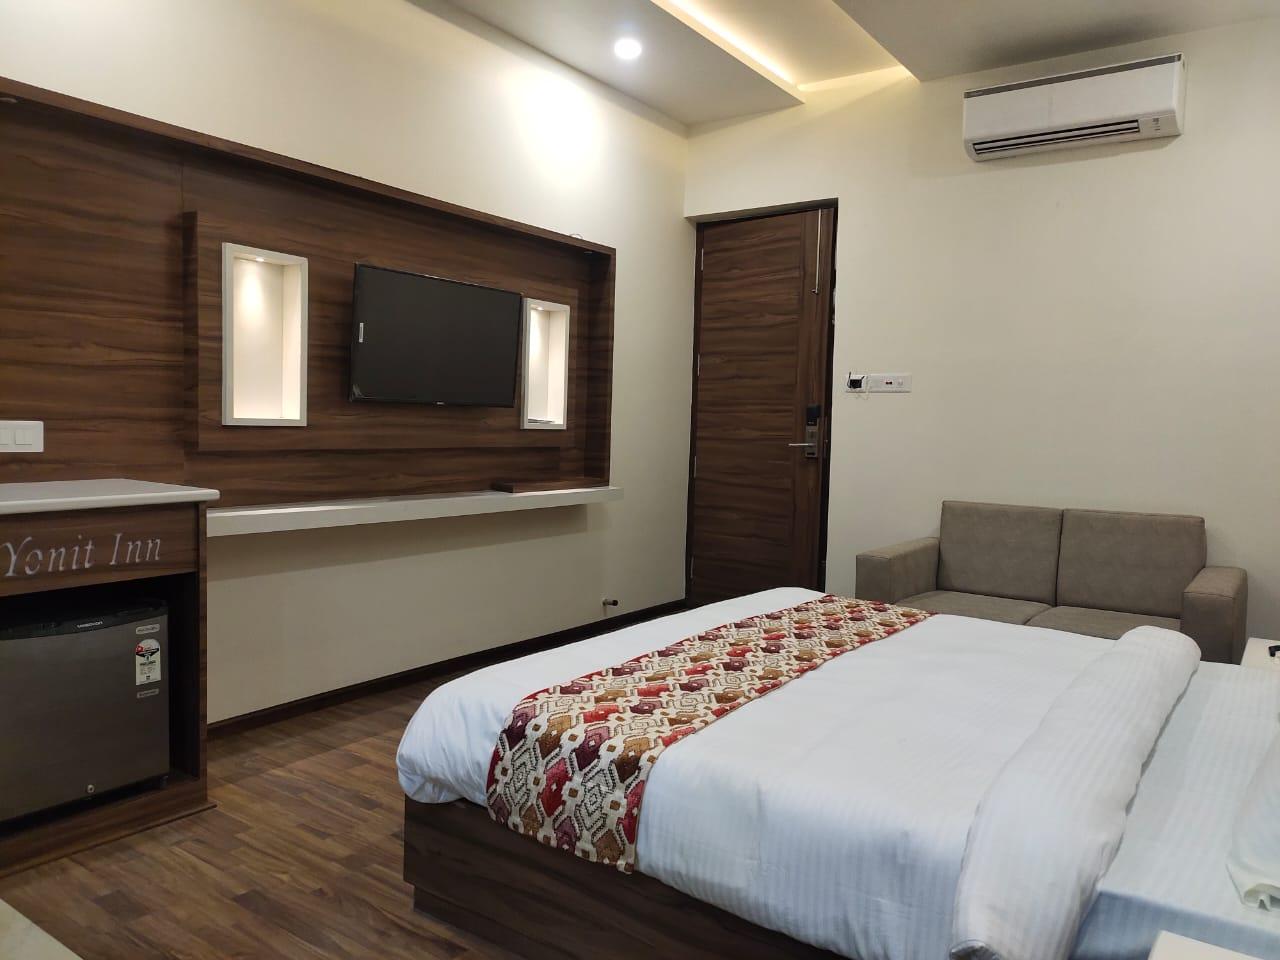 Hotel Yonit Inn